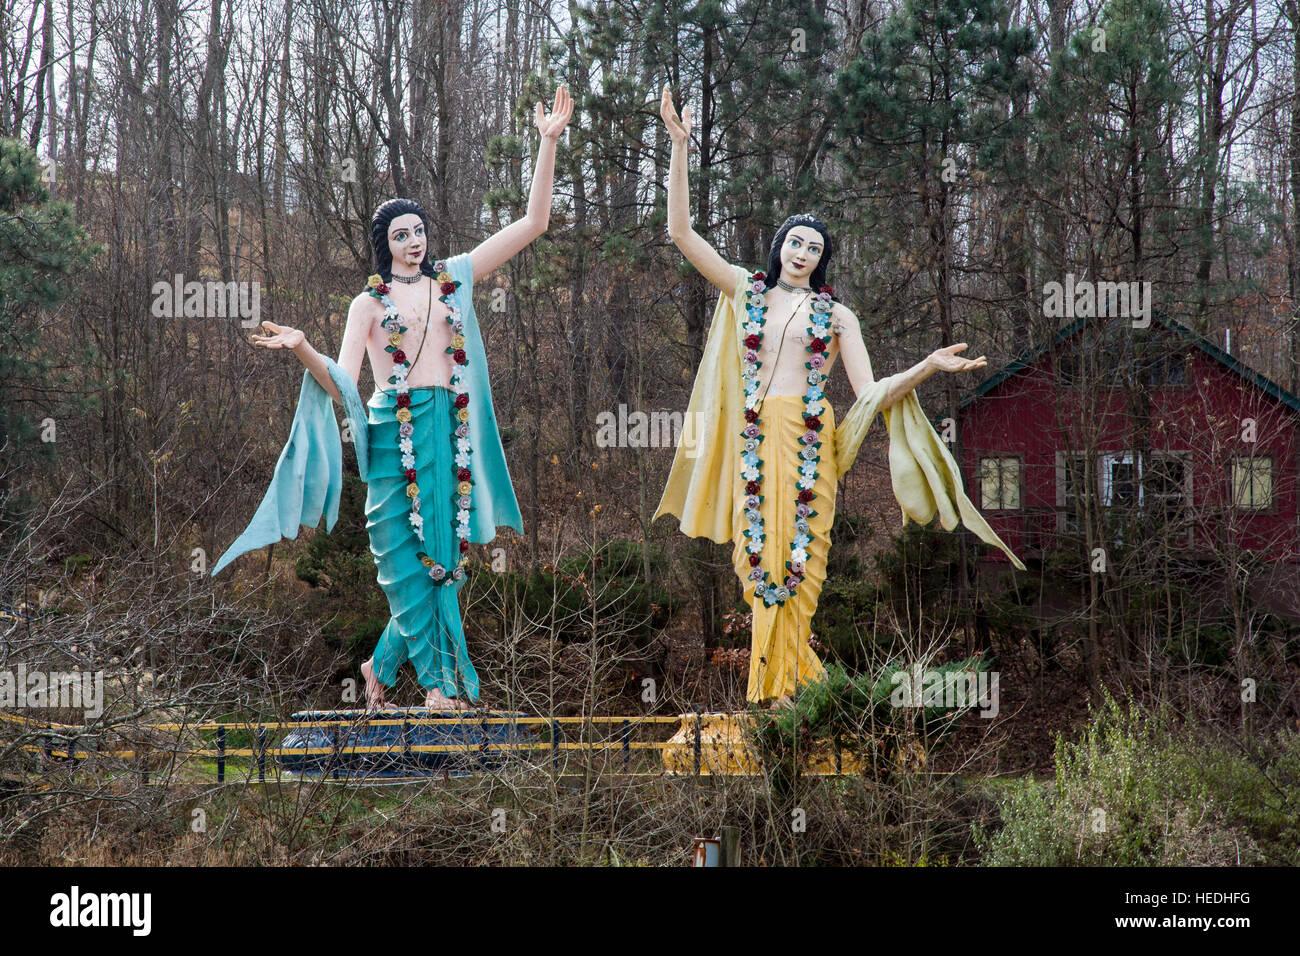 New Vrindaban, West Virginia - Statues of Sri Sri Gaura Nitai, two Hindu deities, at New Vrindaban, a spiritual - Stock Image